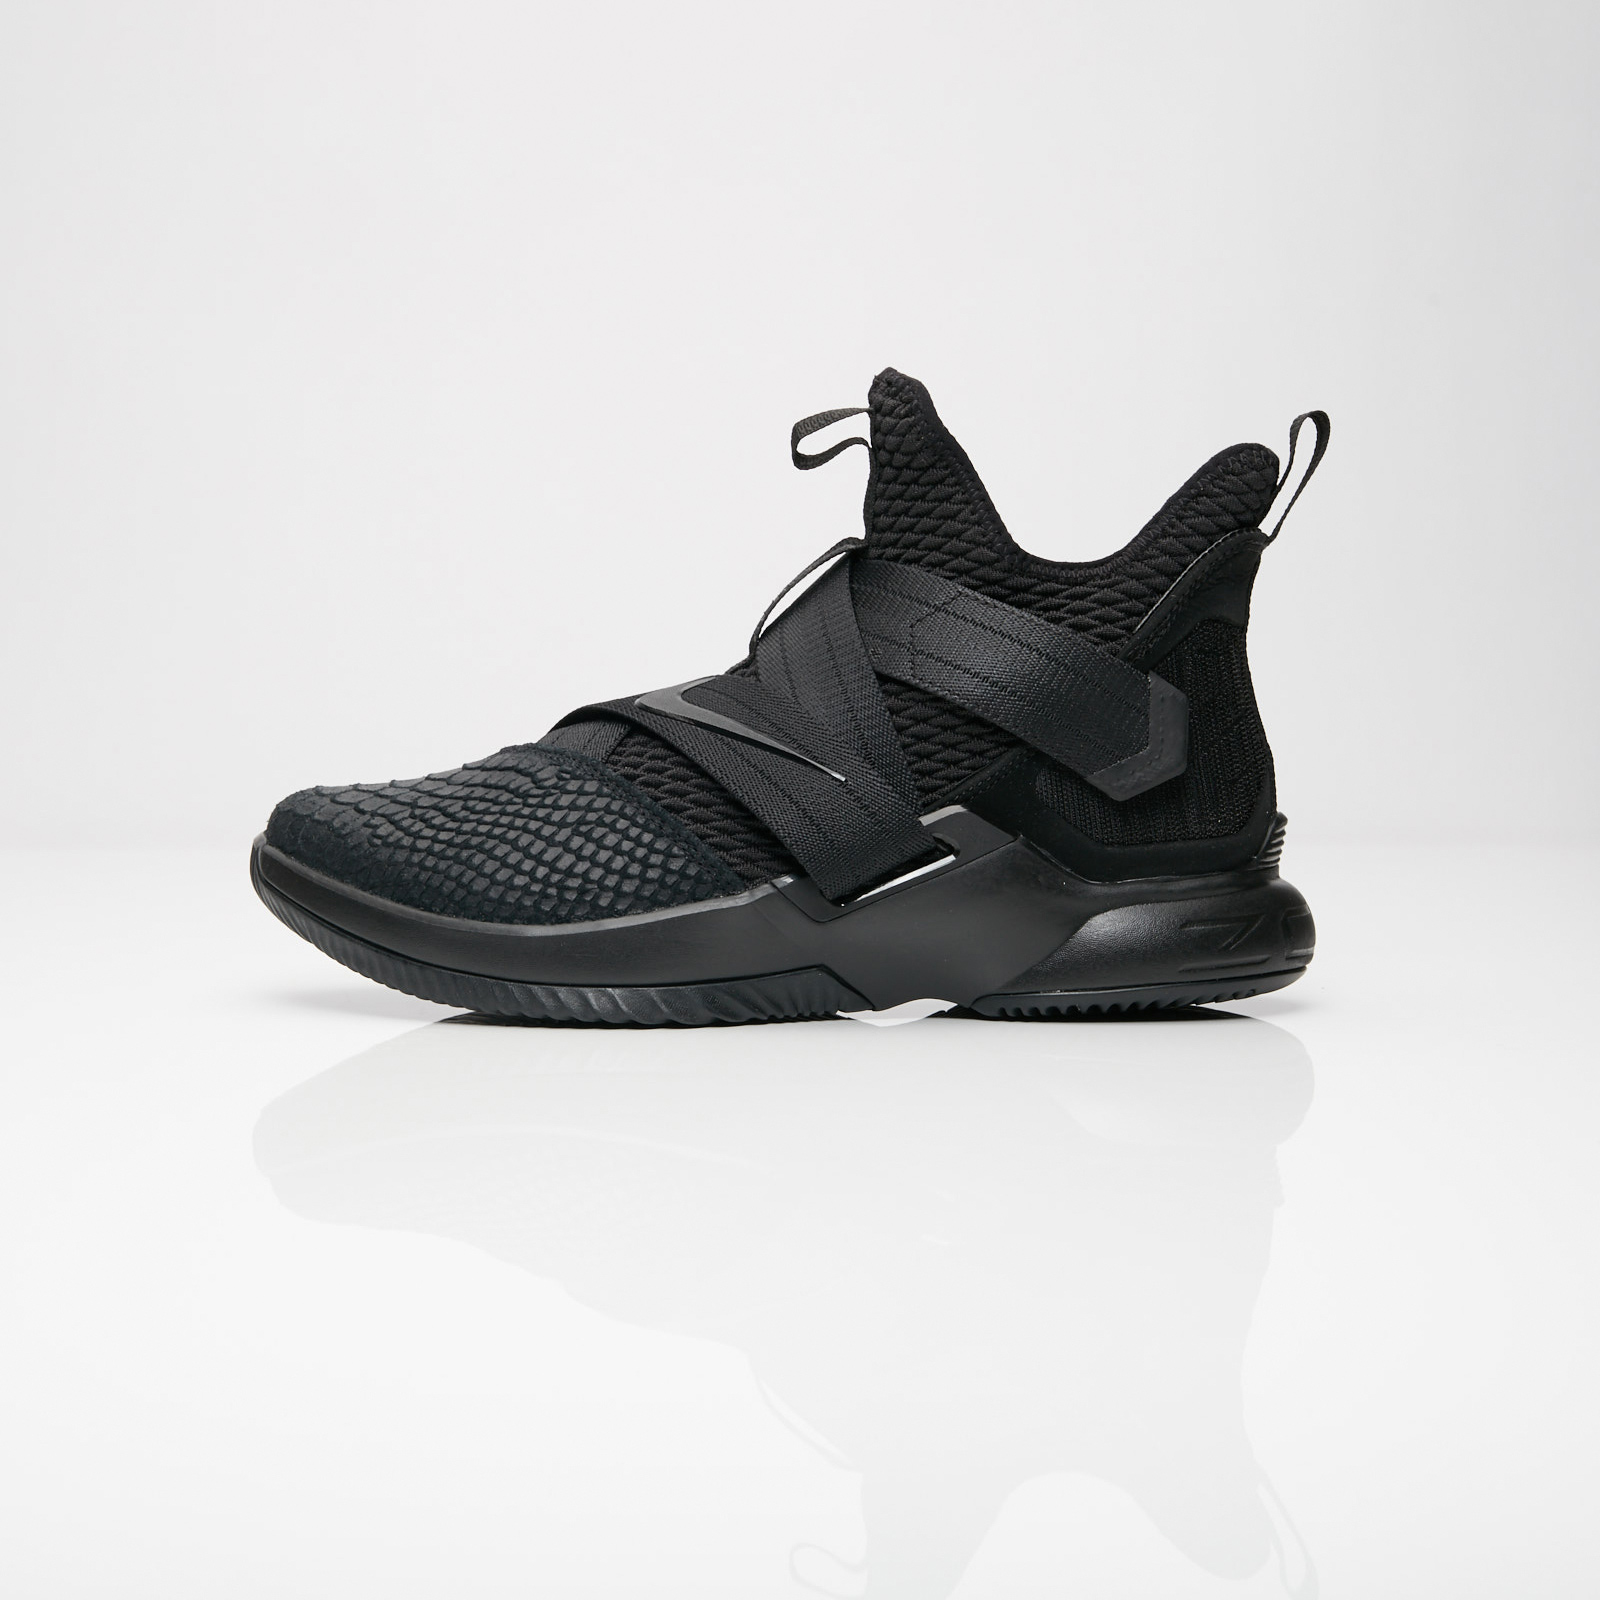 2bde4ae5b0bb Nike Lebron Soldier XII SFG - Ao4054-003 - Sneakersnstuff